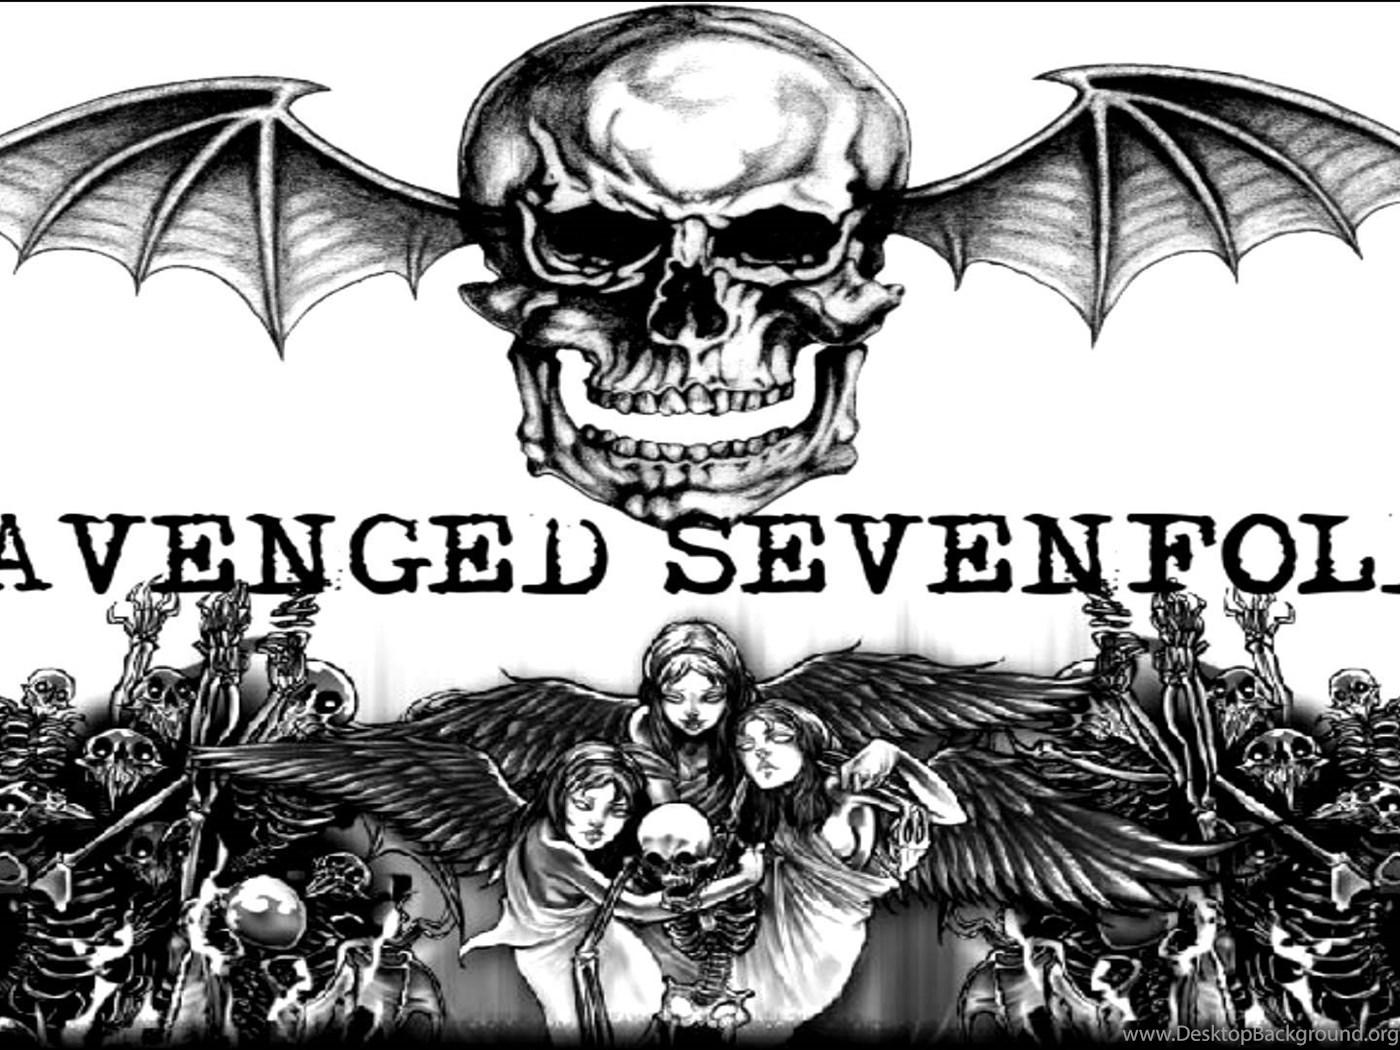 Avenged Sevenfold Deathbat Wallpapers High Quality 2kf Wallpey